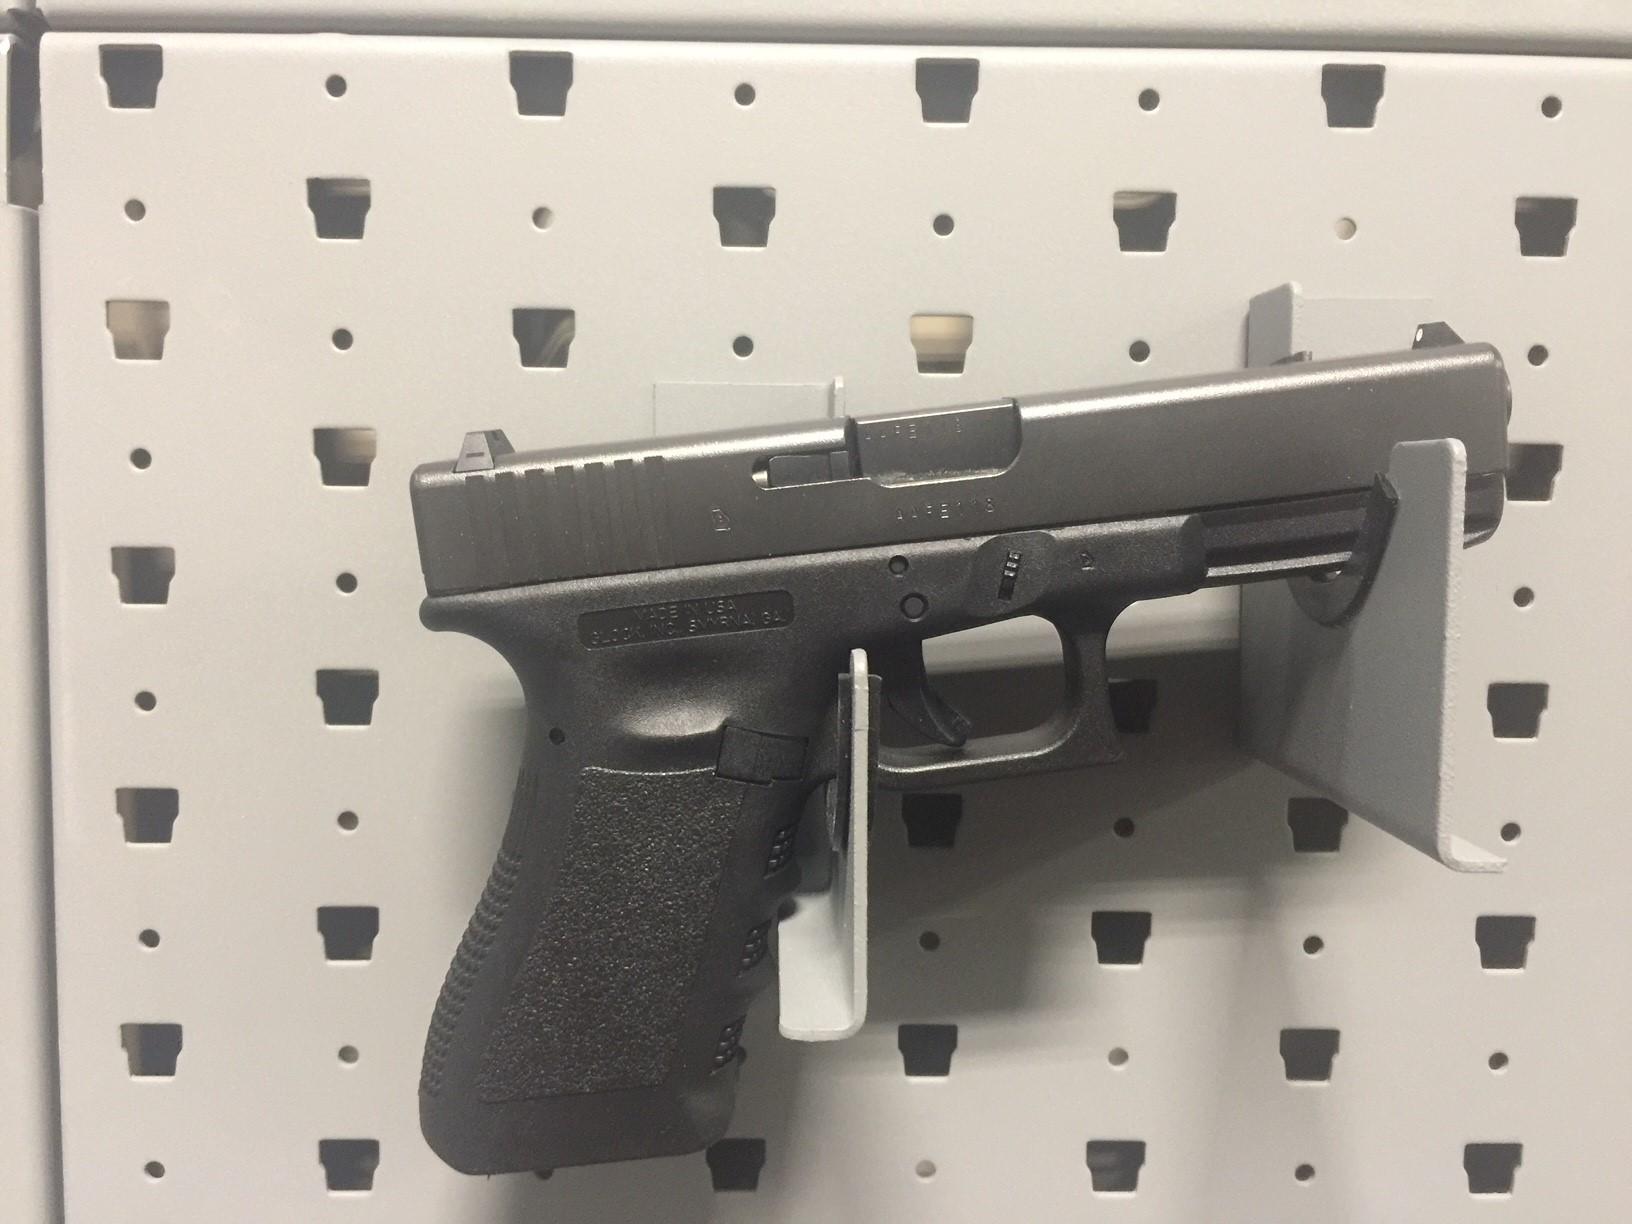 Glock model 22 - 40 Cal $5